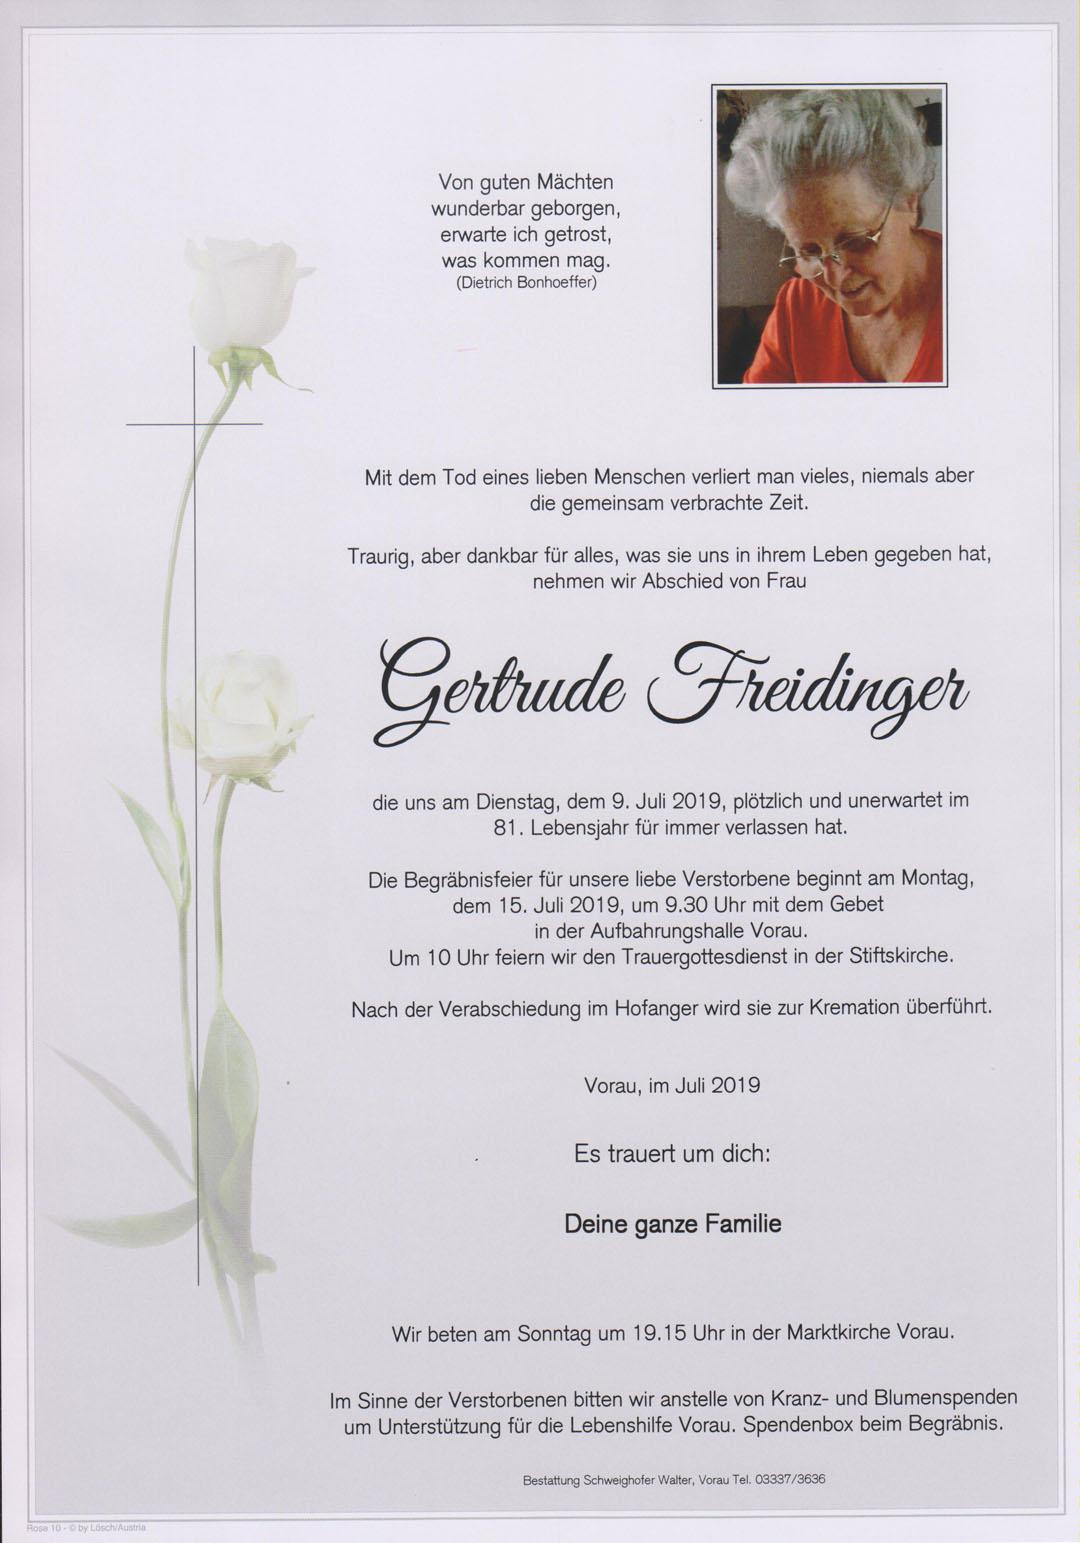 Gertrude Freidinger